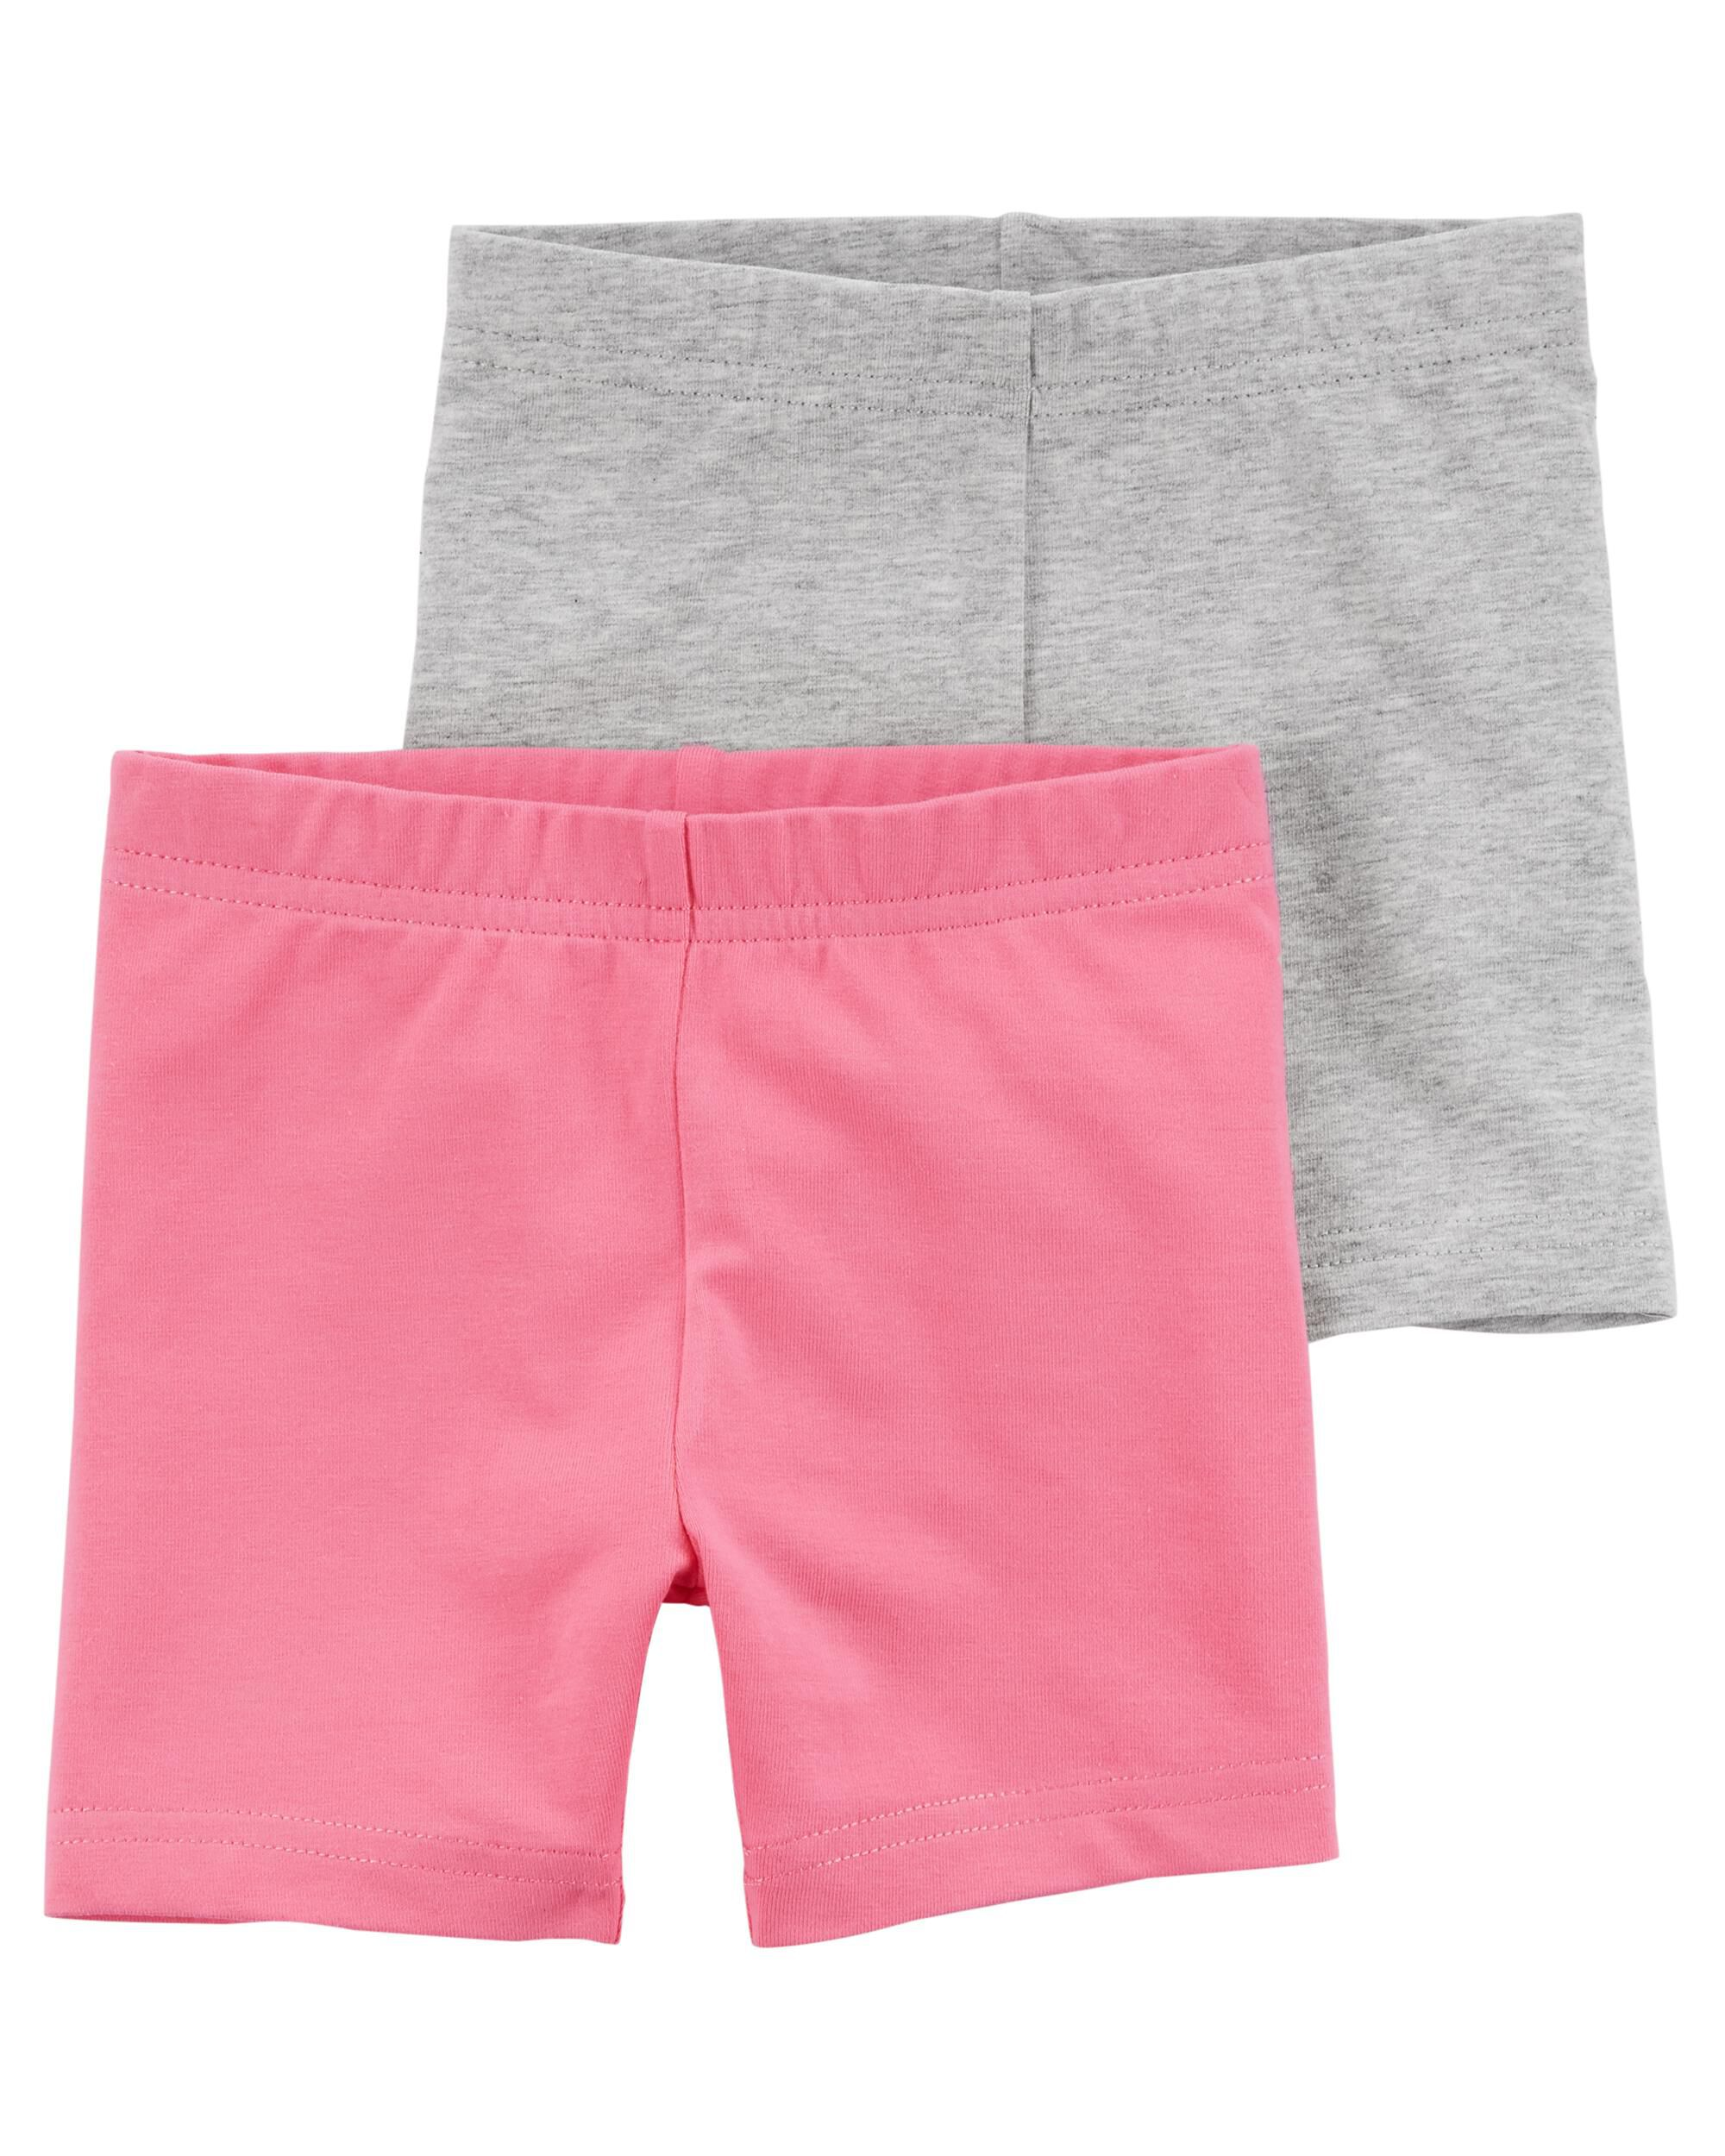 Carters Baby Girls 2-Pack Tumbling Shorts